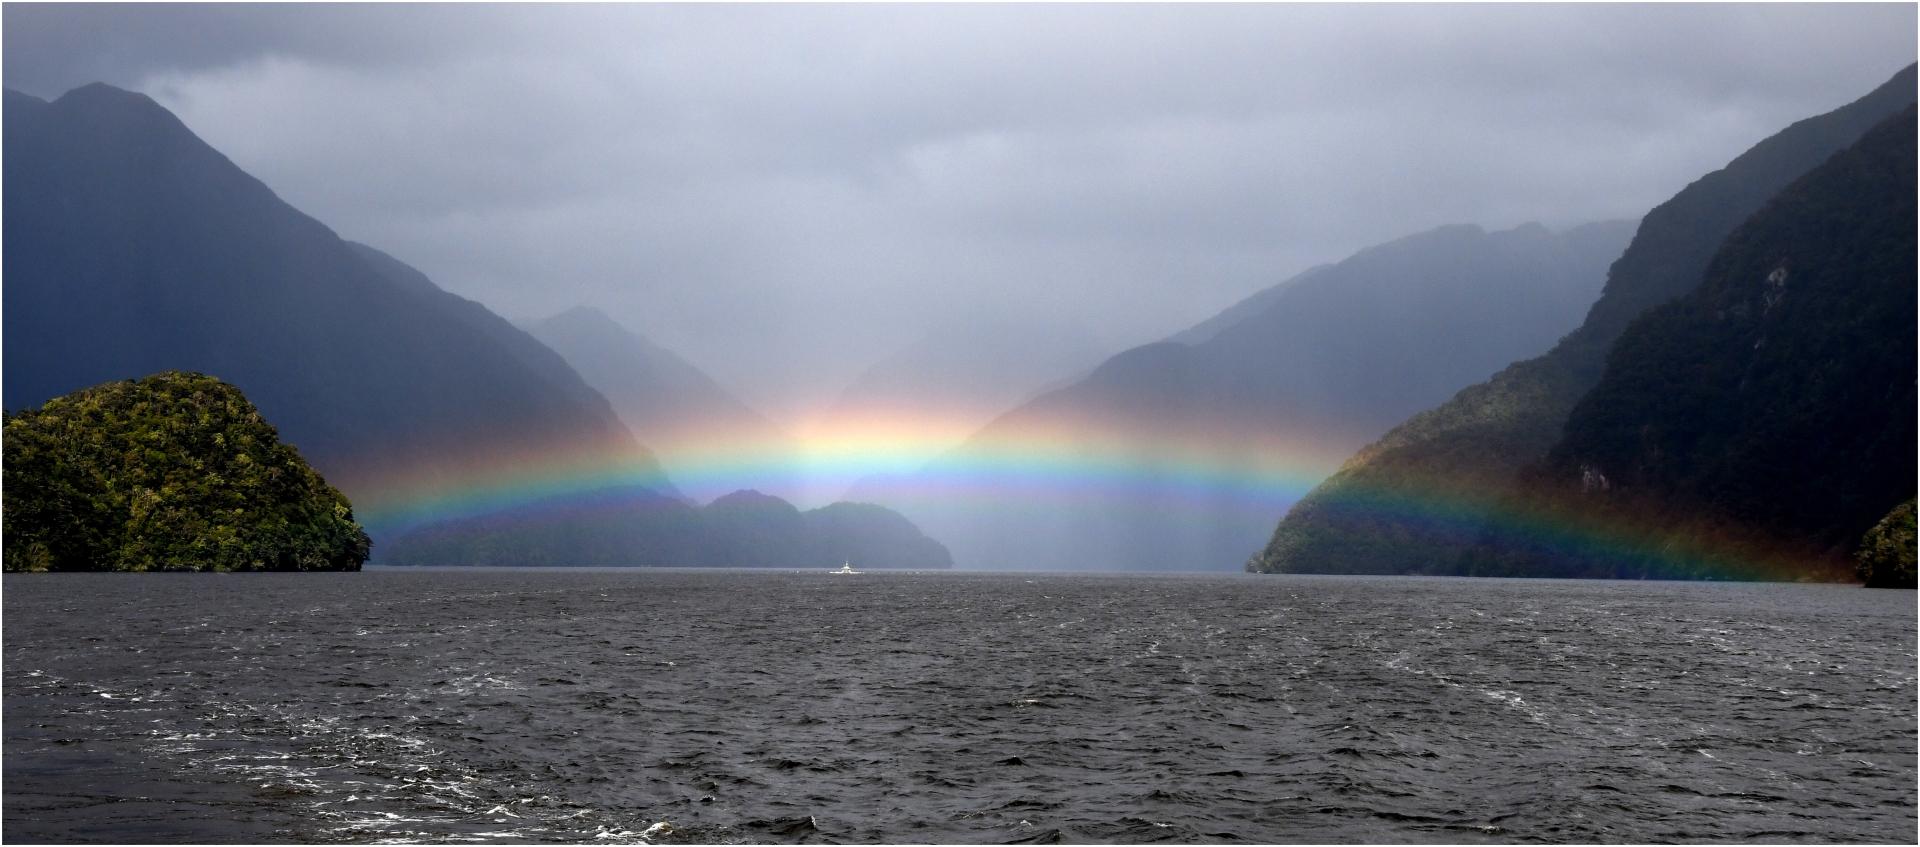 3419_Rainbow_David Mitchell